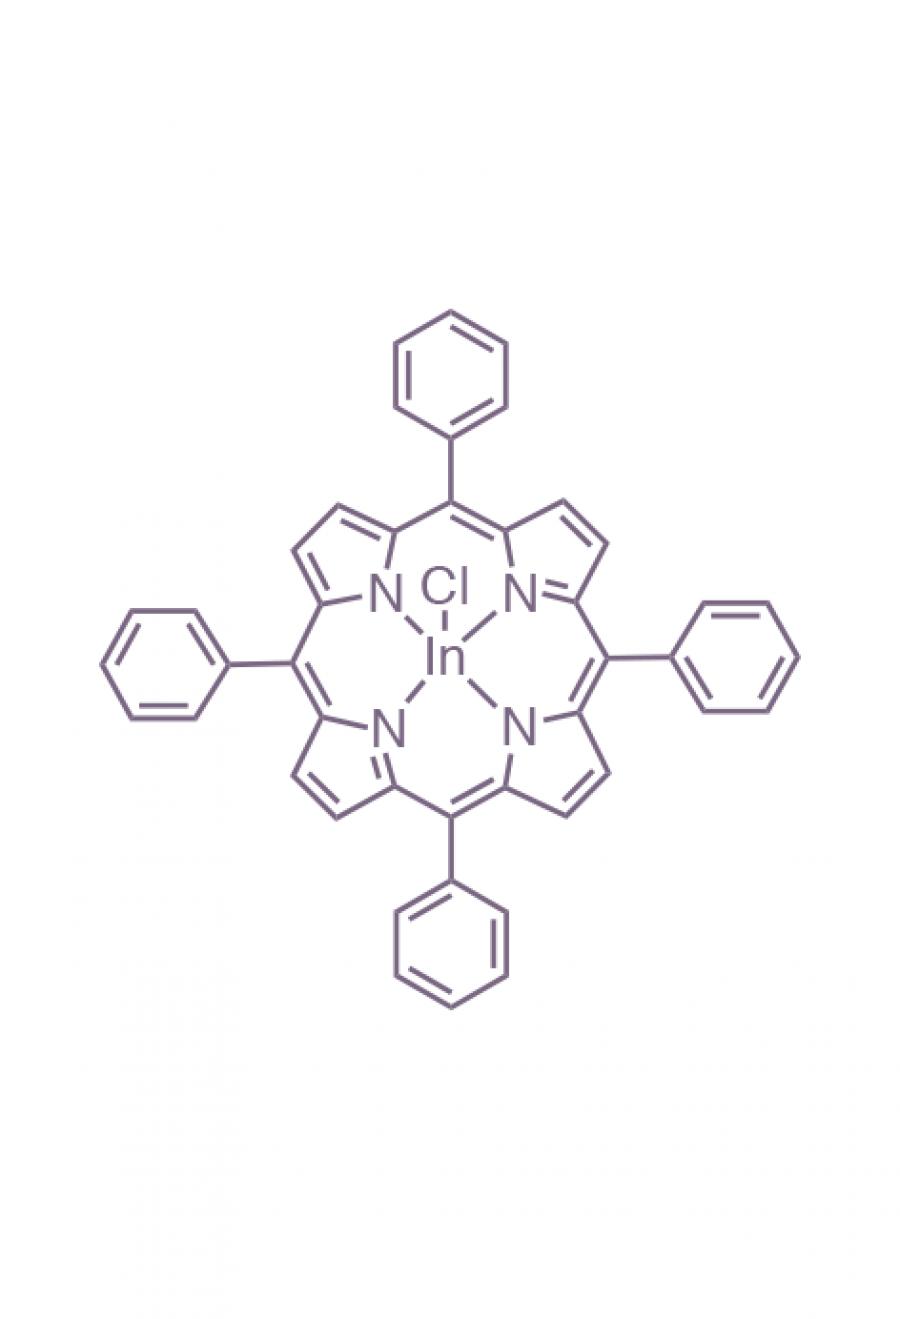 indium(III) 5,10,15,20-(tetraphenyl)porphyrin chloride